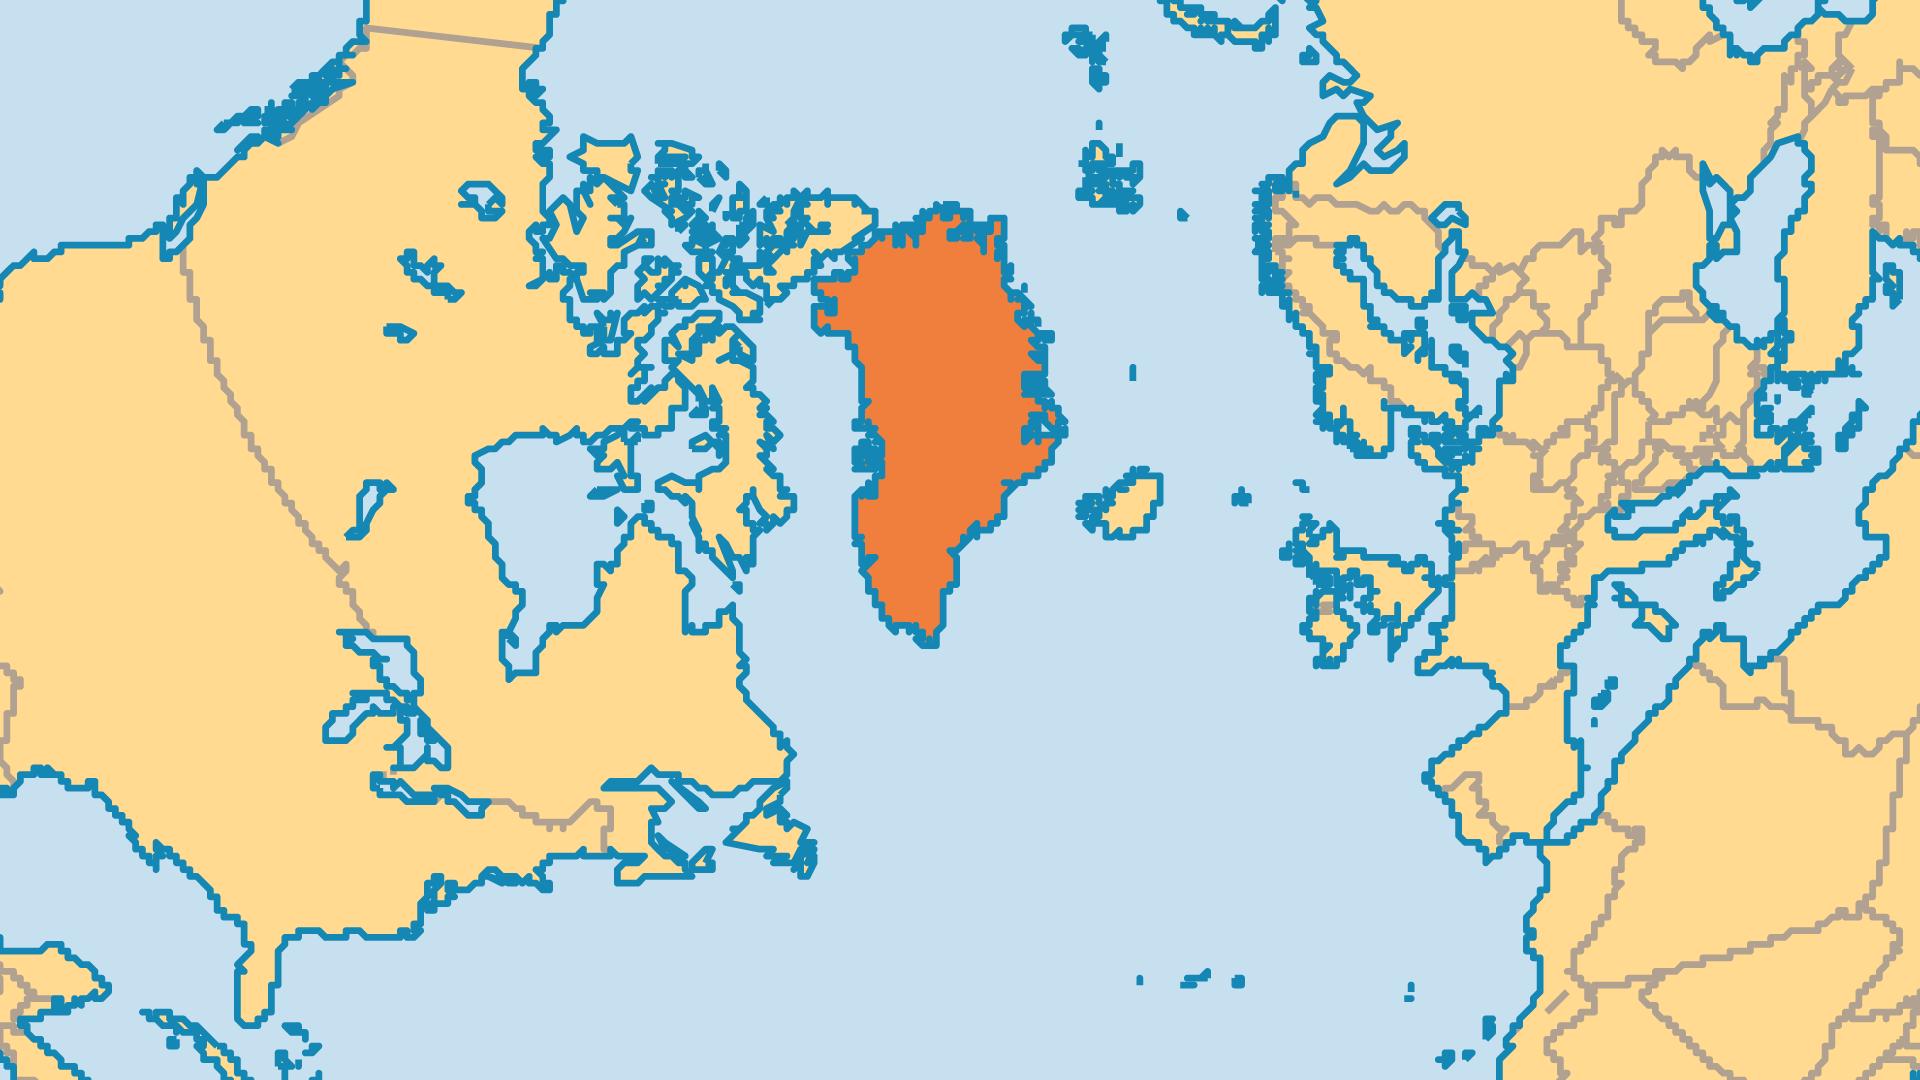 Locator Map for Greenland